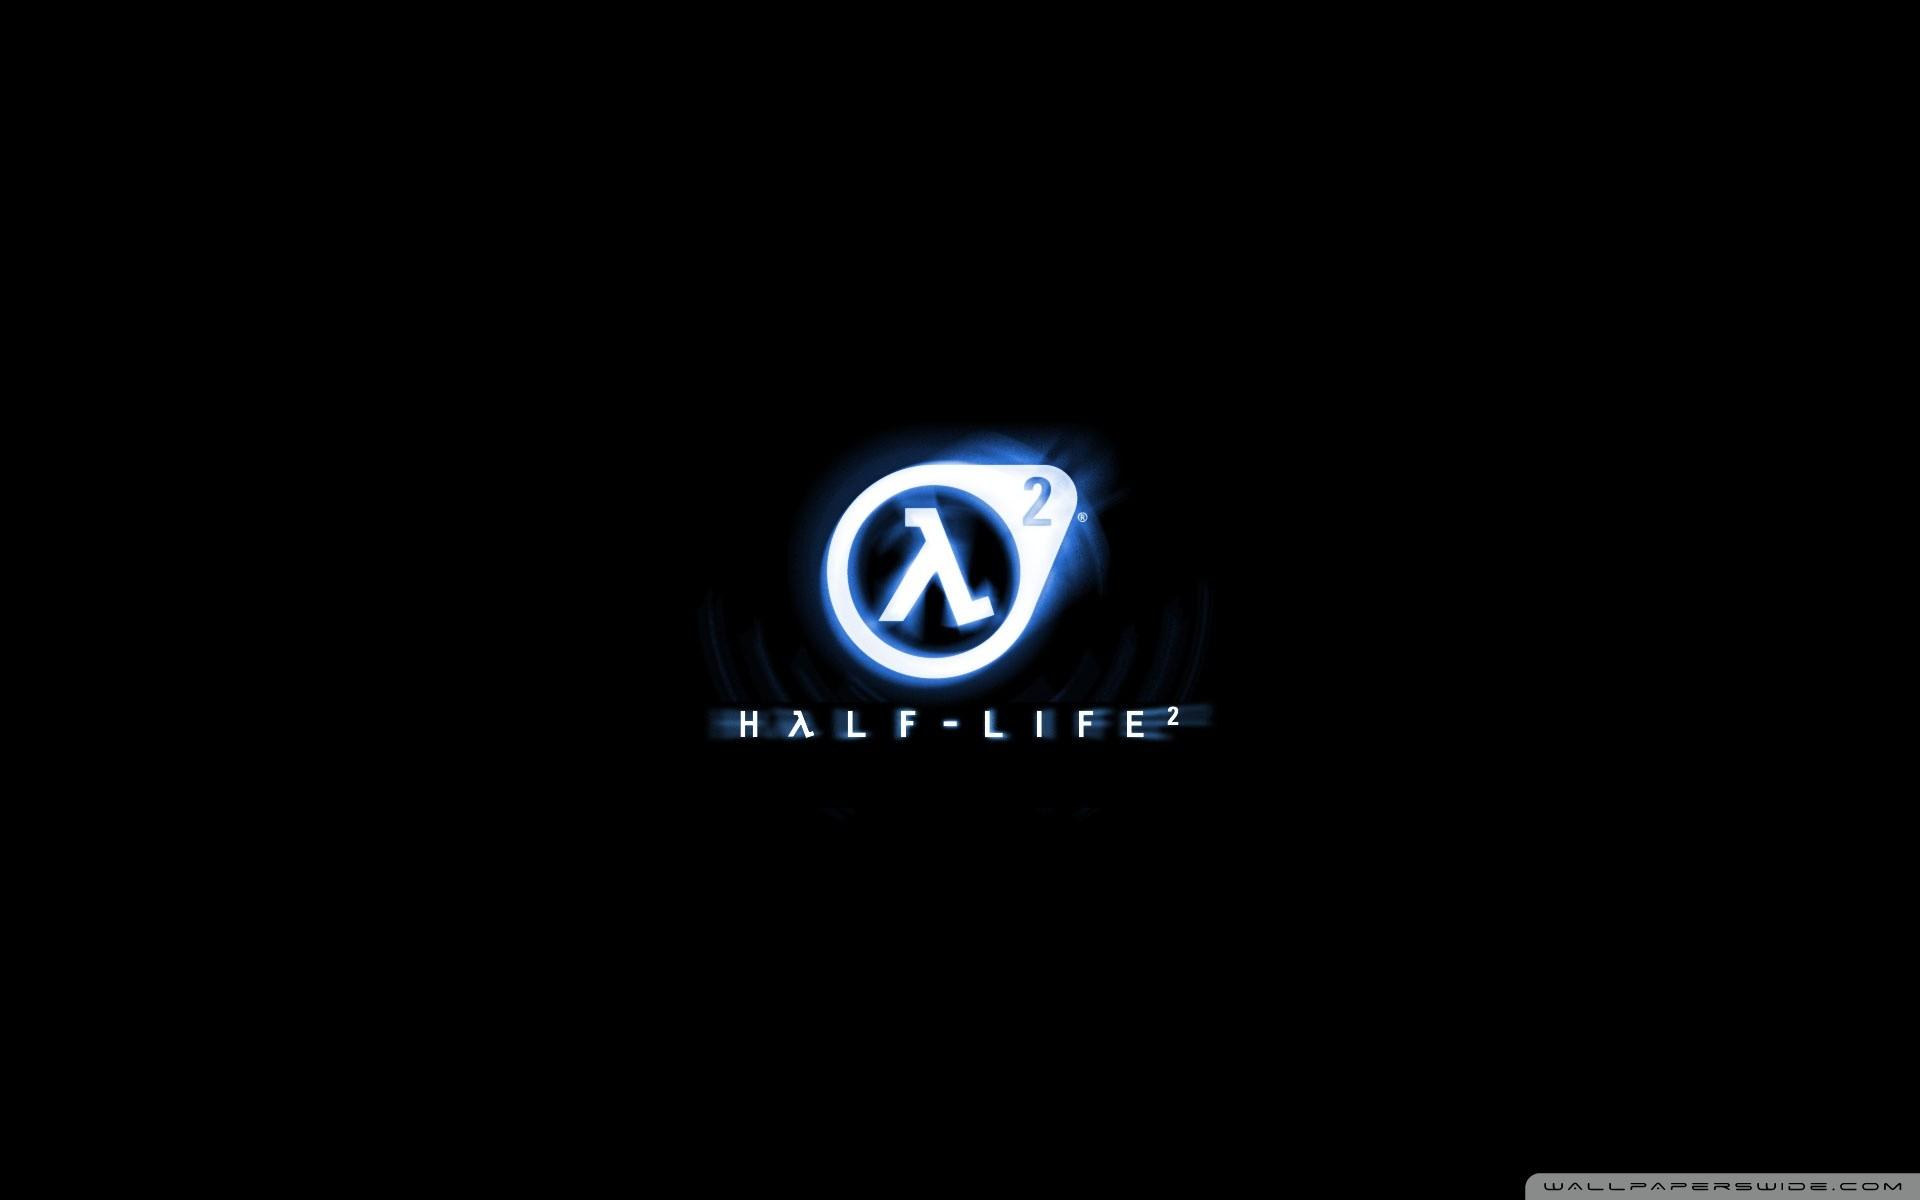 Half-Life 2 – 4 HD Wide Wallpaper for Widescreen